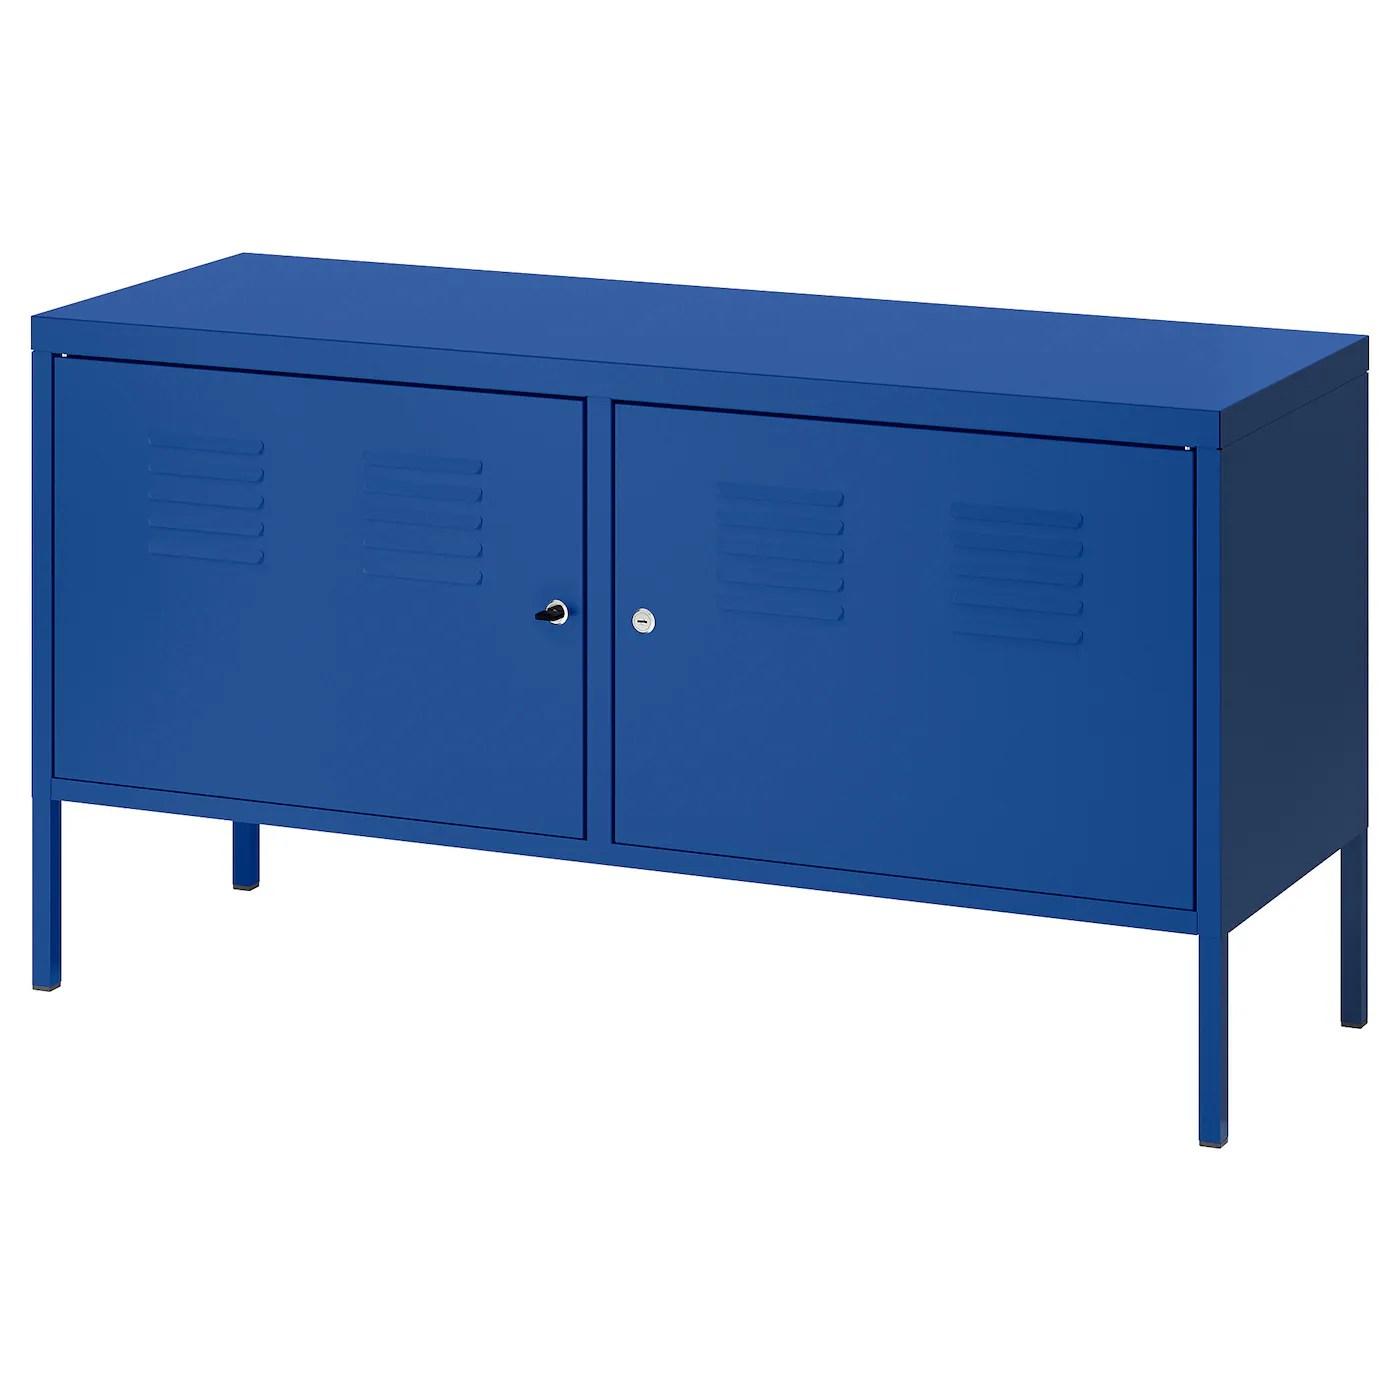 Ikea Ps Cabinet Blue 46 7 8x24 3 4 Reviews Ikea